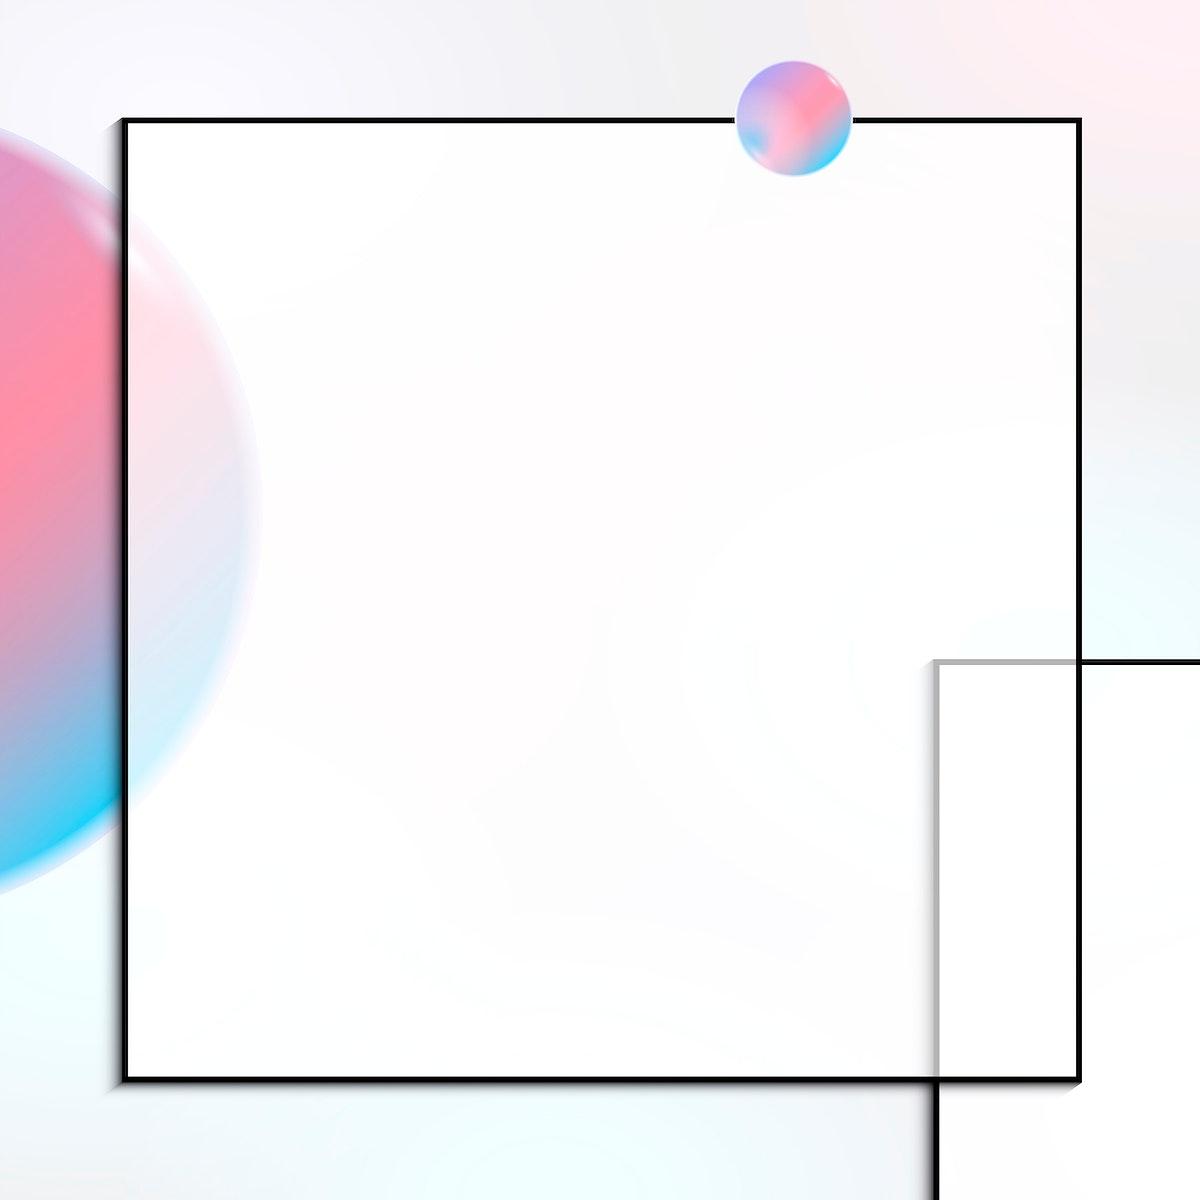 Pink and blue square frame design vector